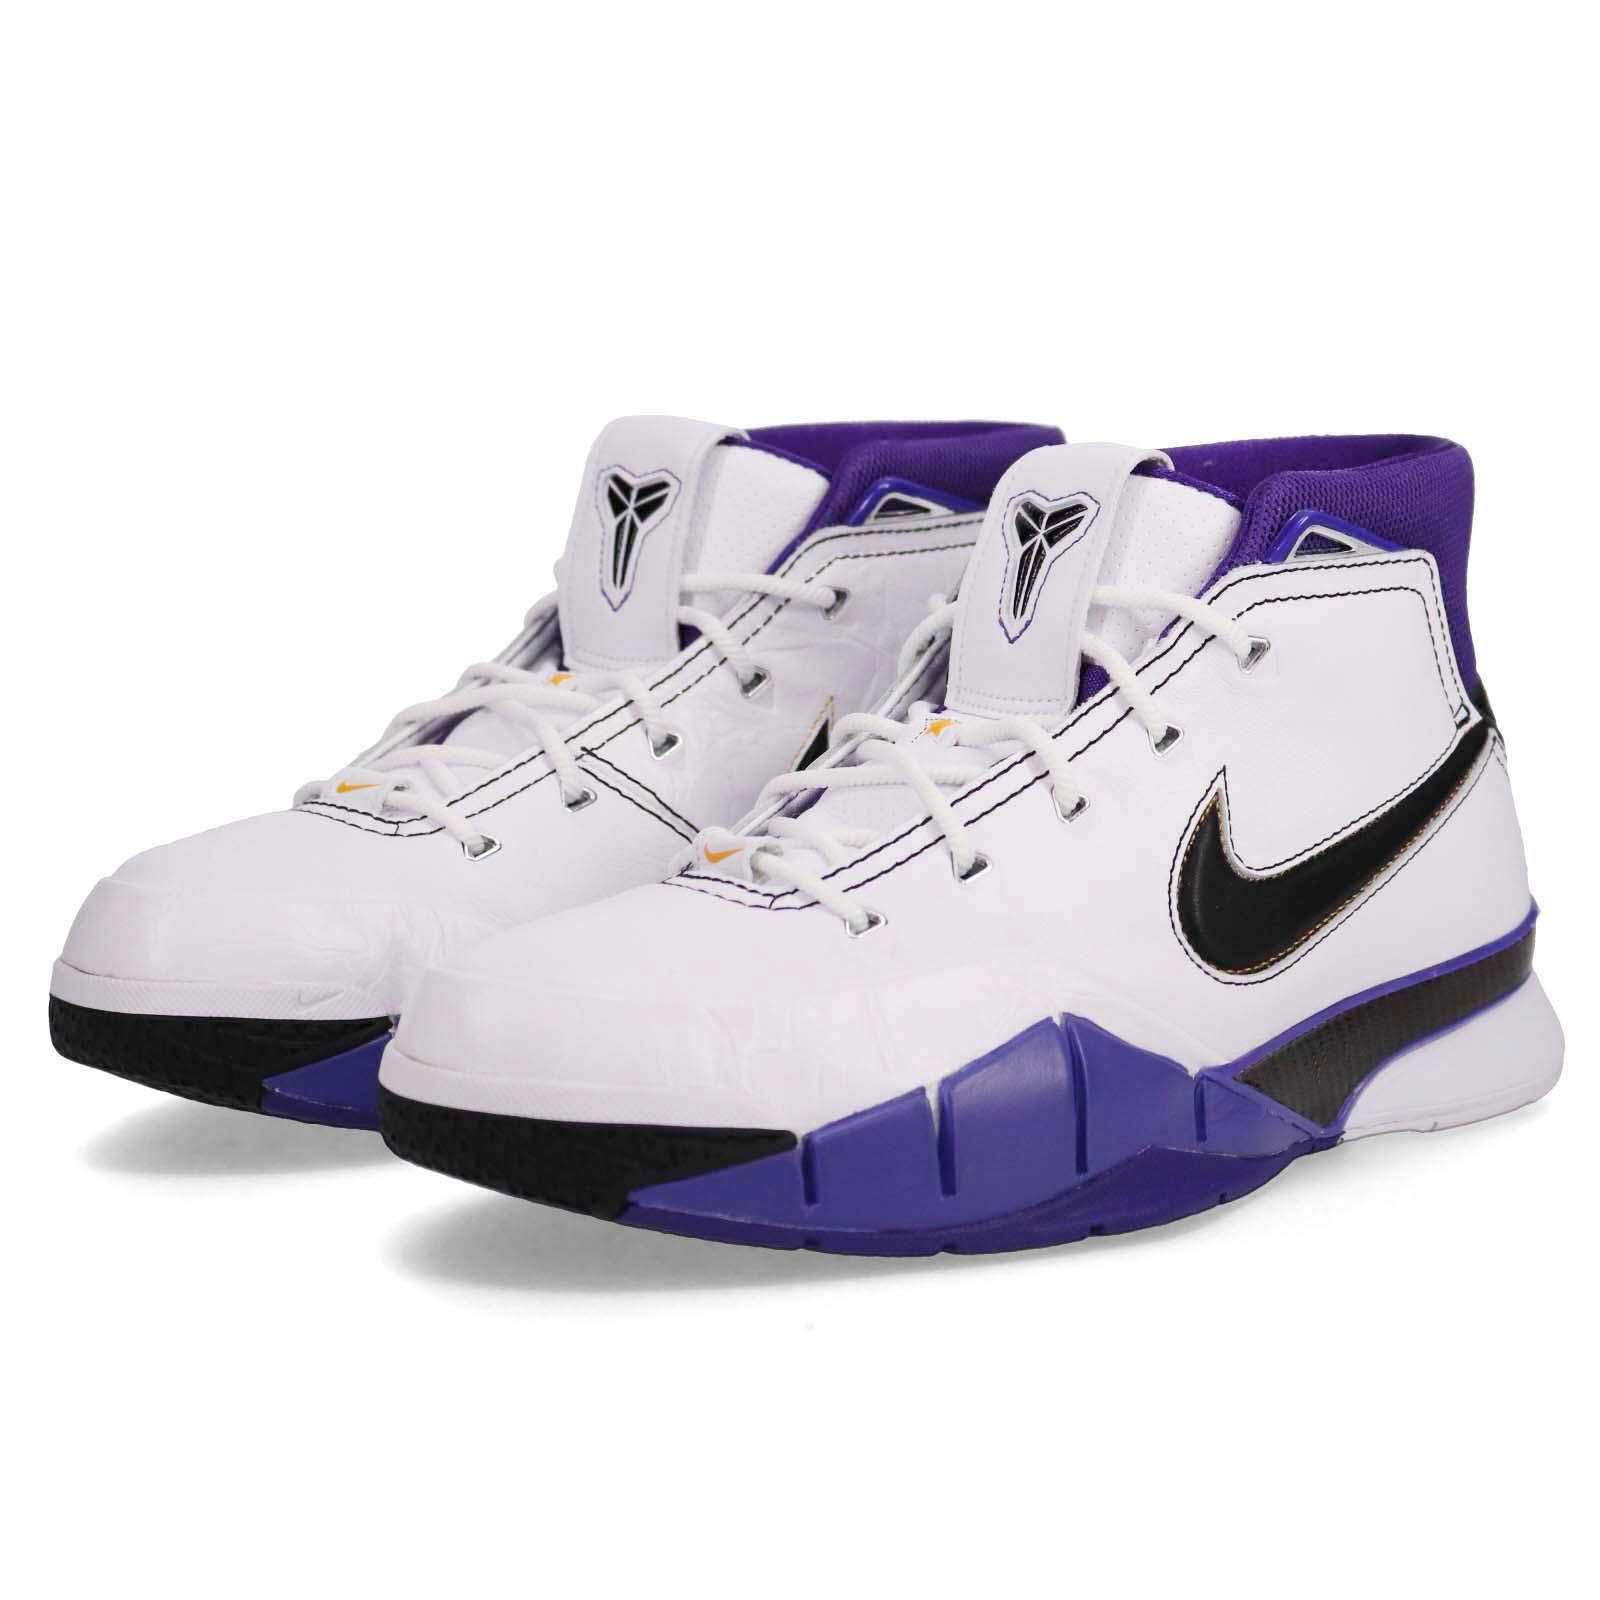 Nike 籃球鞋 Kobe 1 PROTRO 男鞋 AQ2728-105